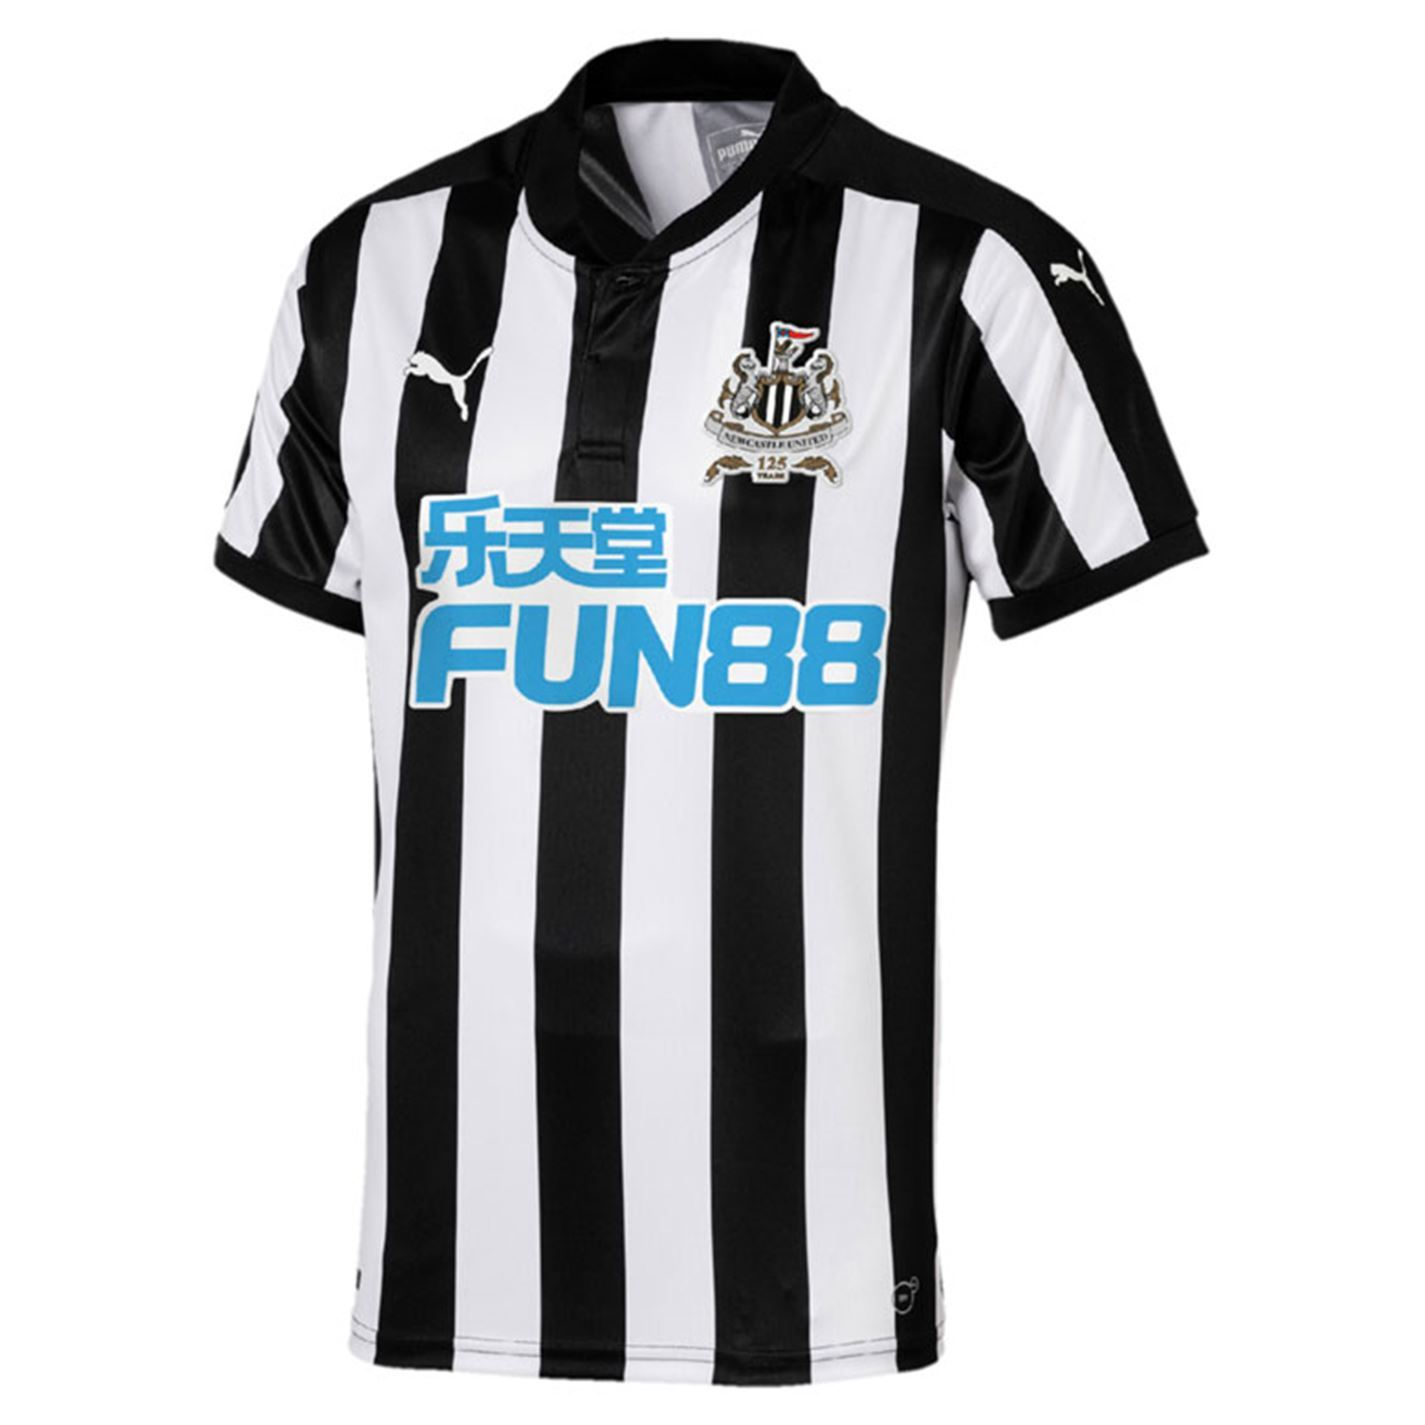 ... Puma Newcastle United Home Jersey 2017-18 Mens Black White Football  Soccer Shirt ... 143698d5b0967